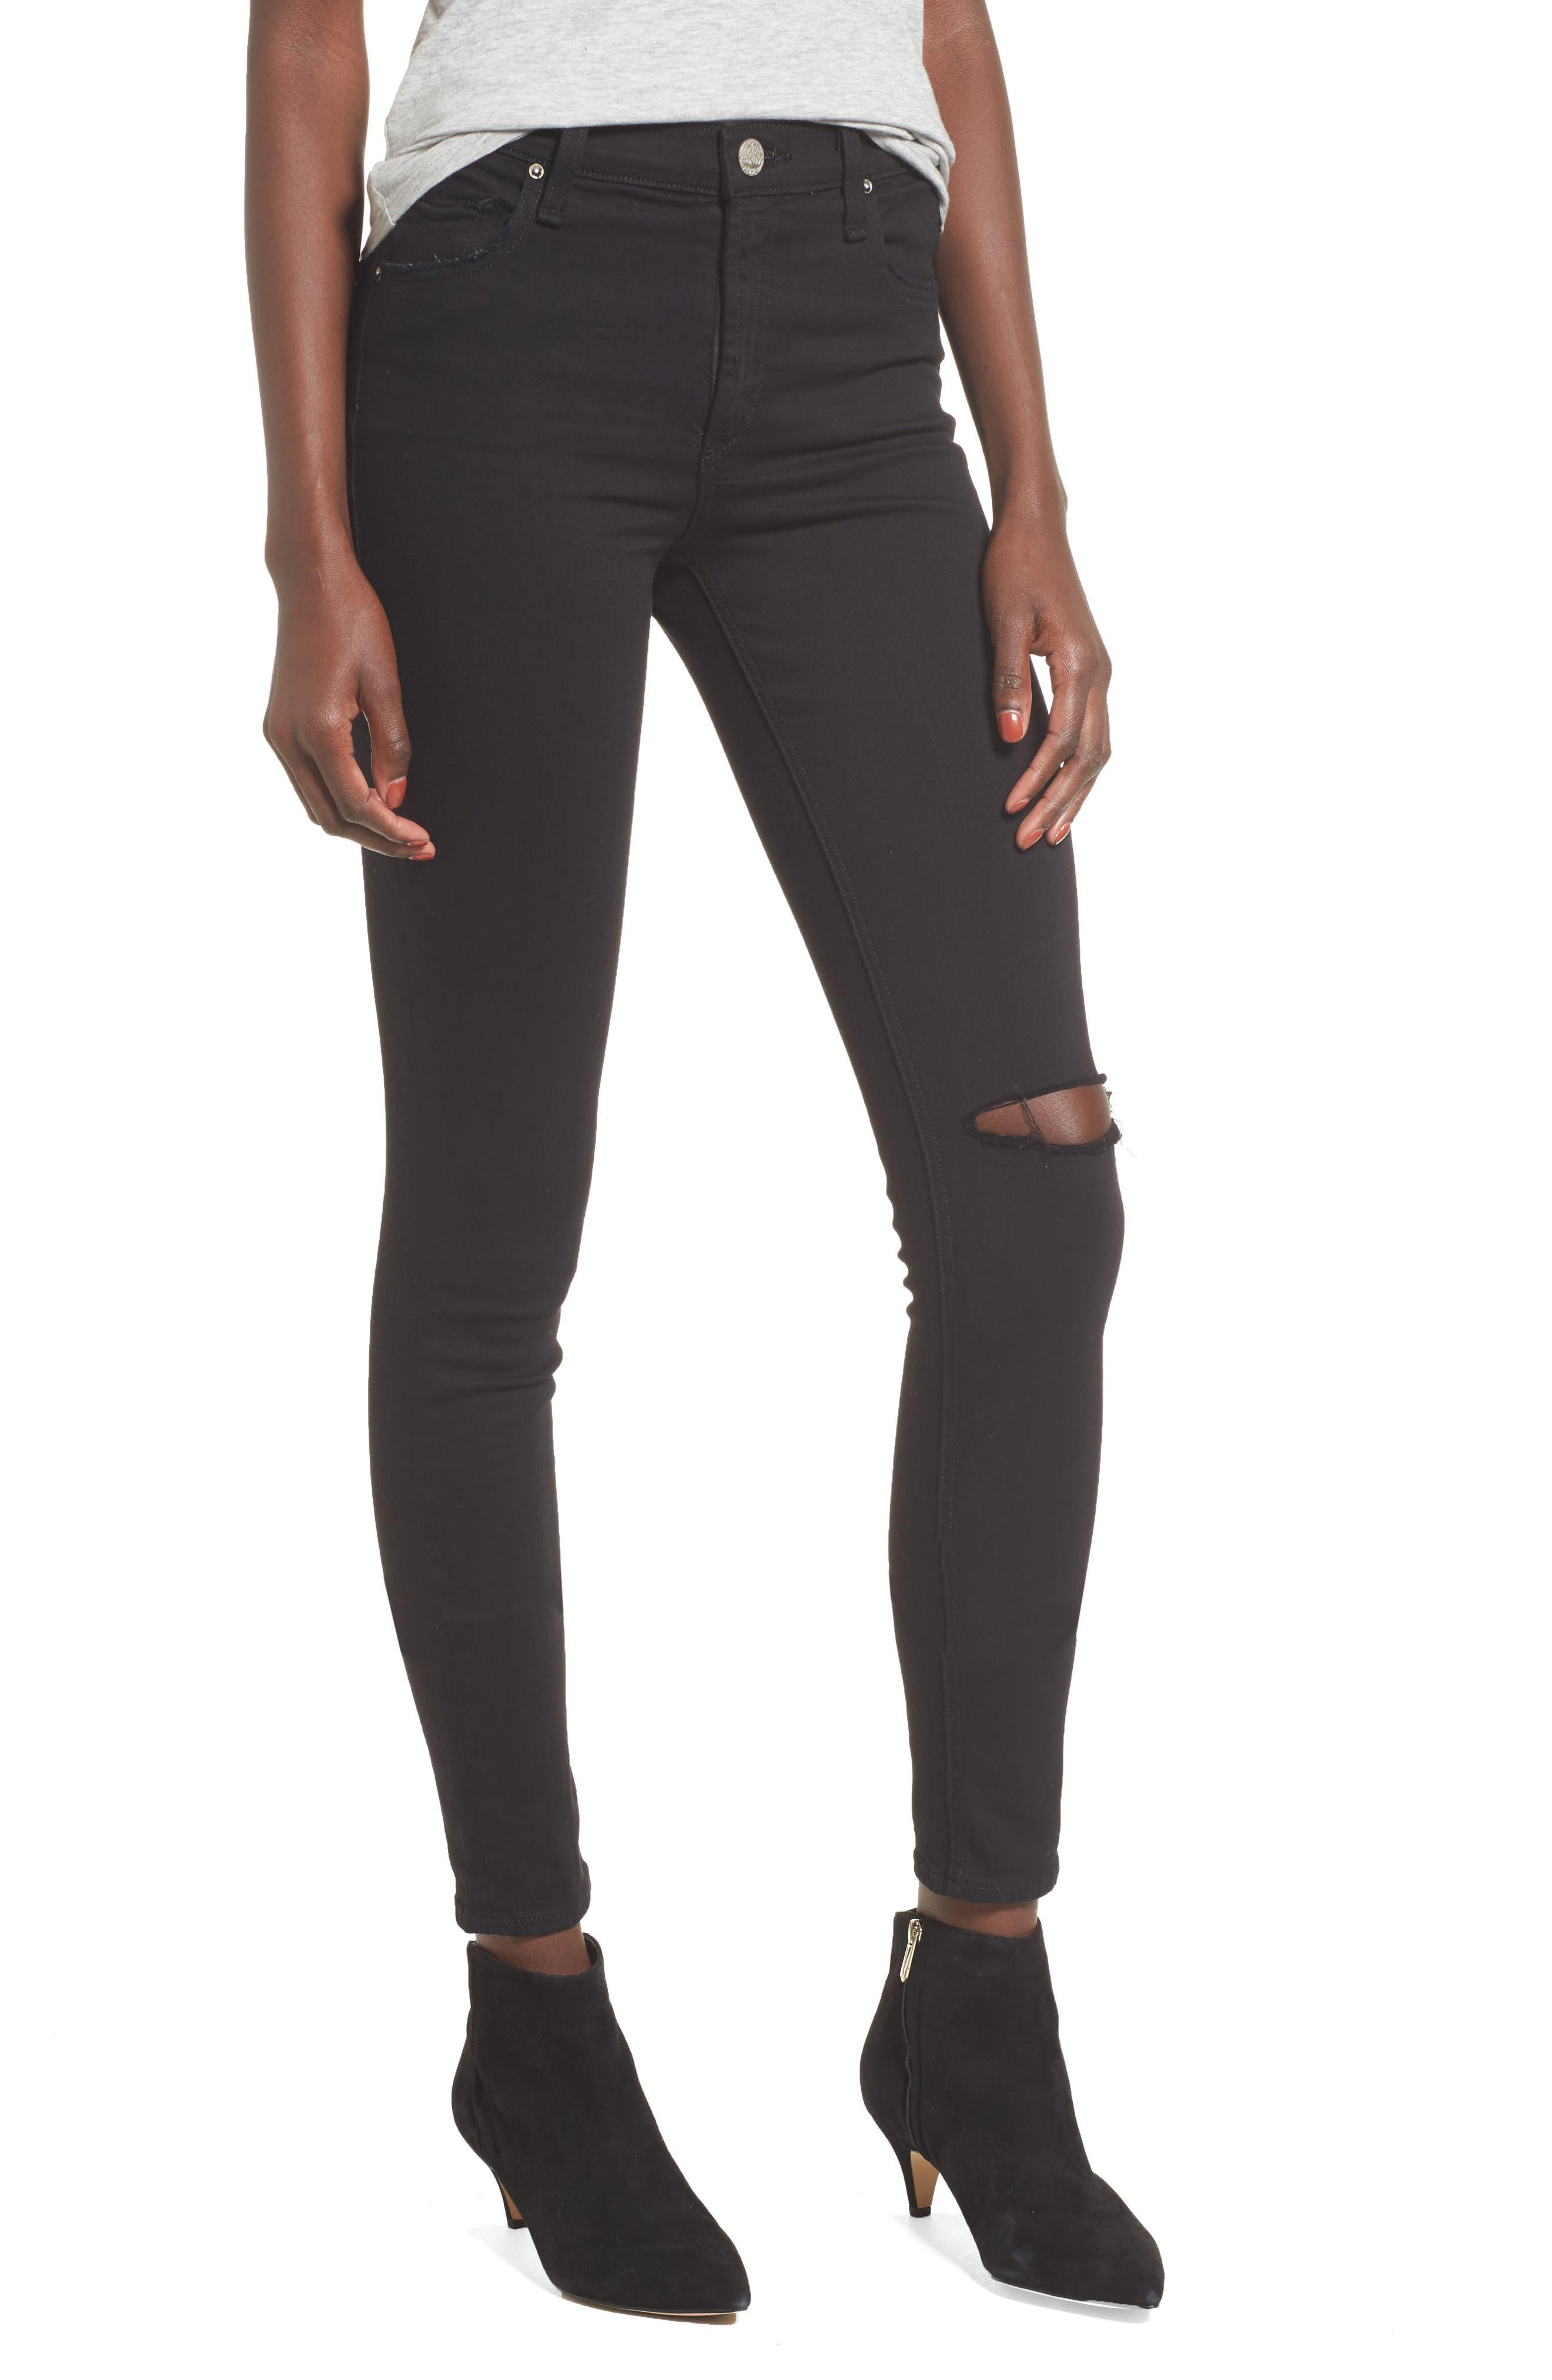 Newton High Waist Ankle Skinny Jeans,                             Main thumbnail 1, color,                             Reposado